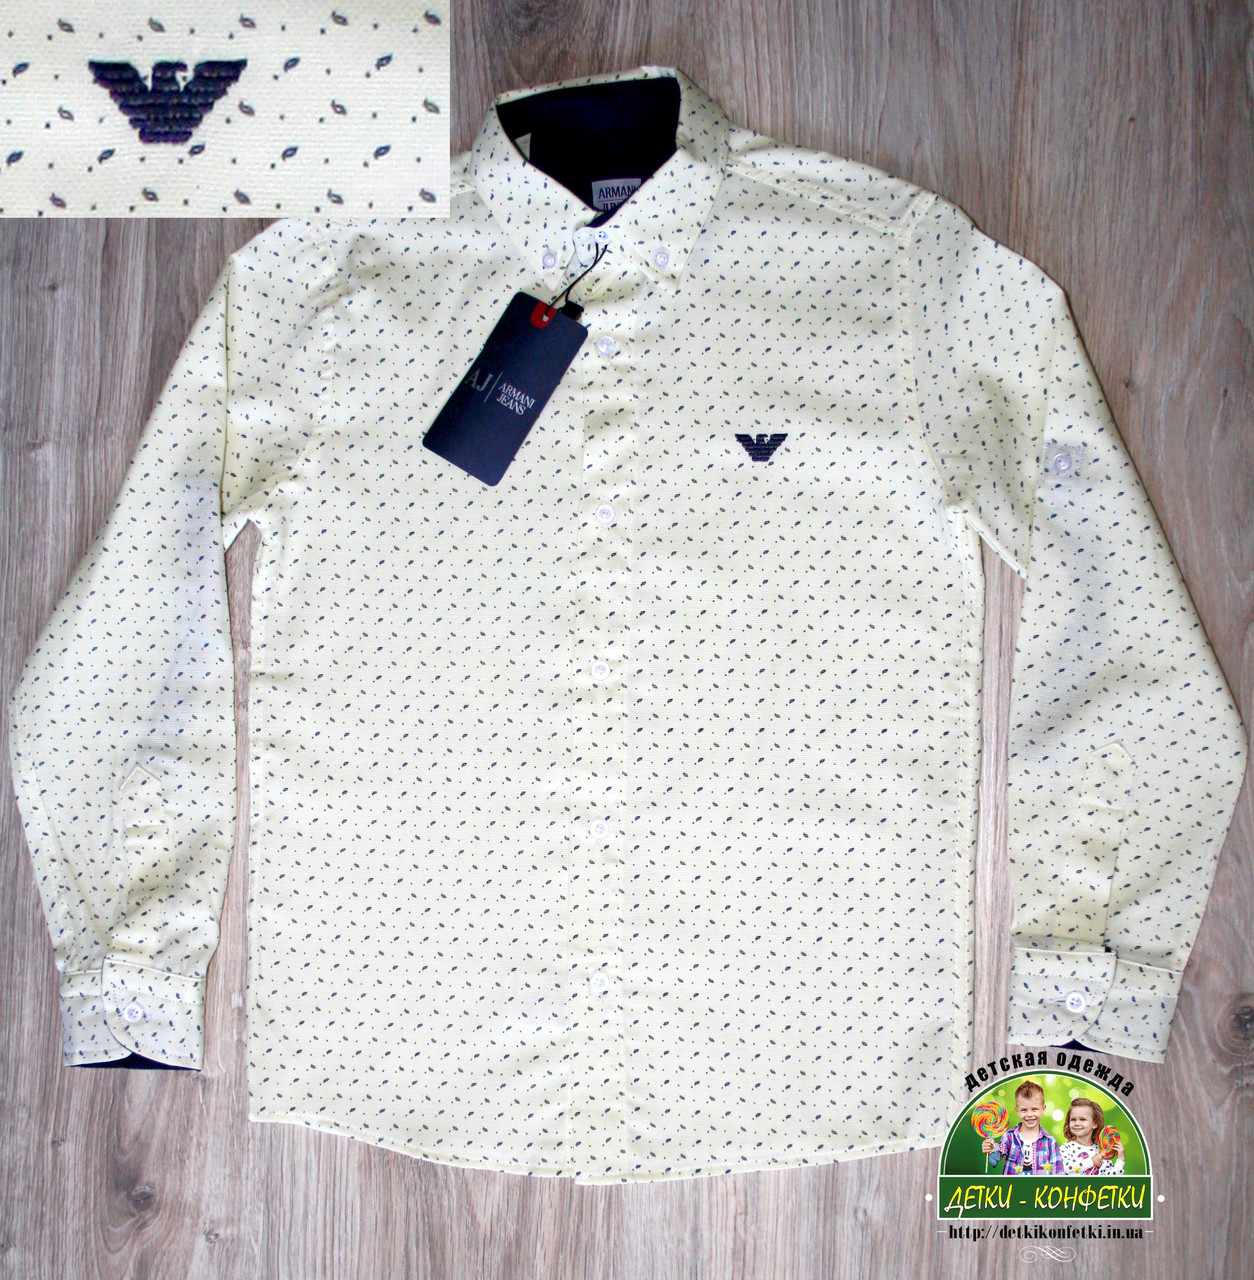 Рубашка ARMANI для мальчика 1-2 года